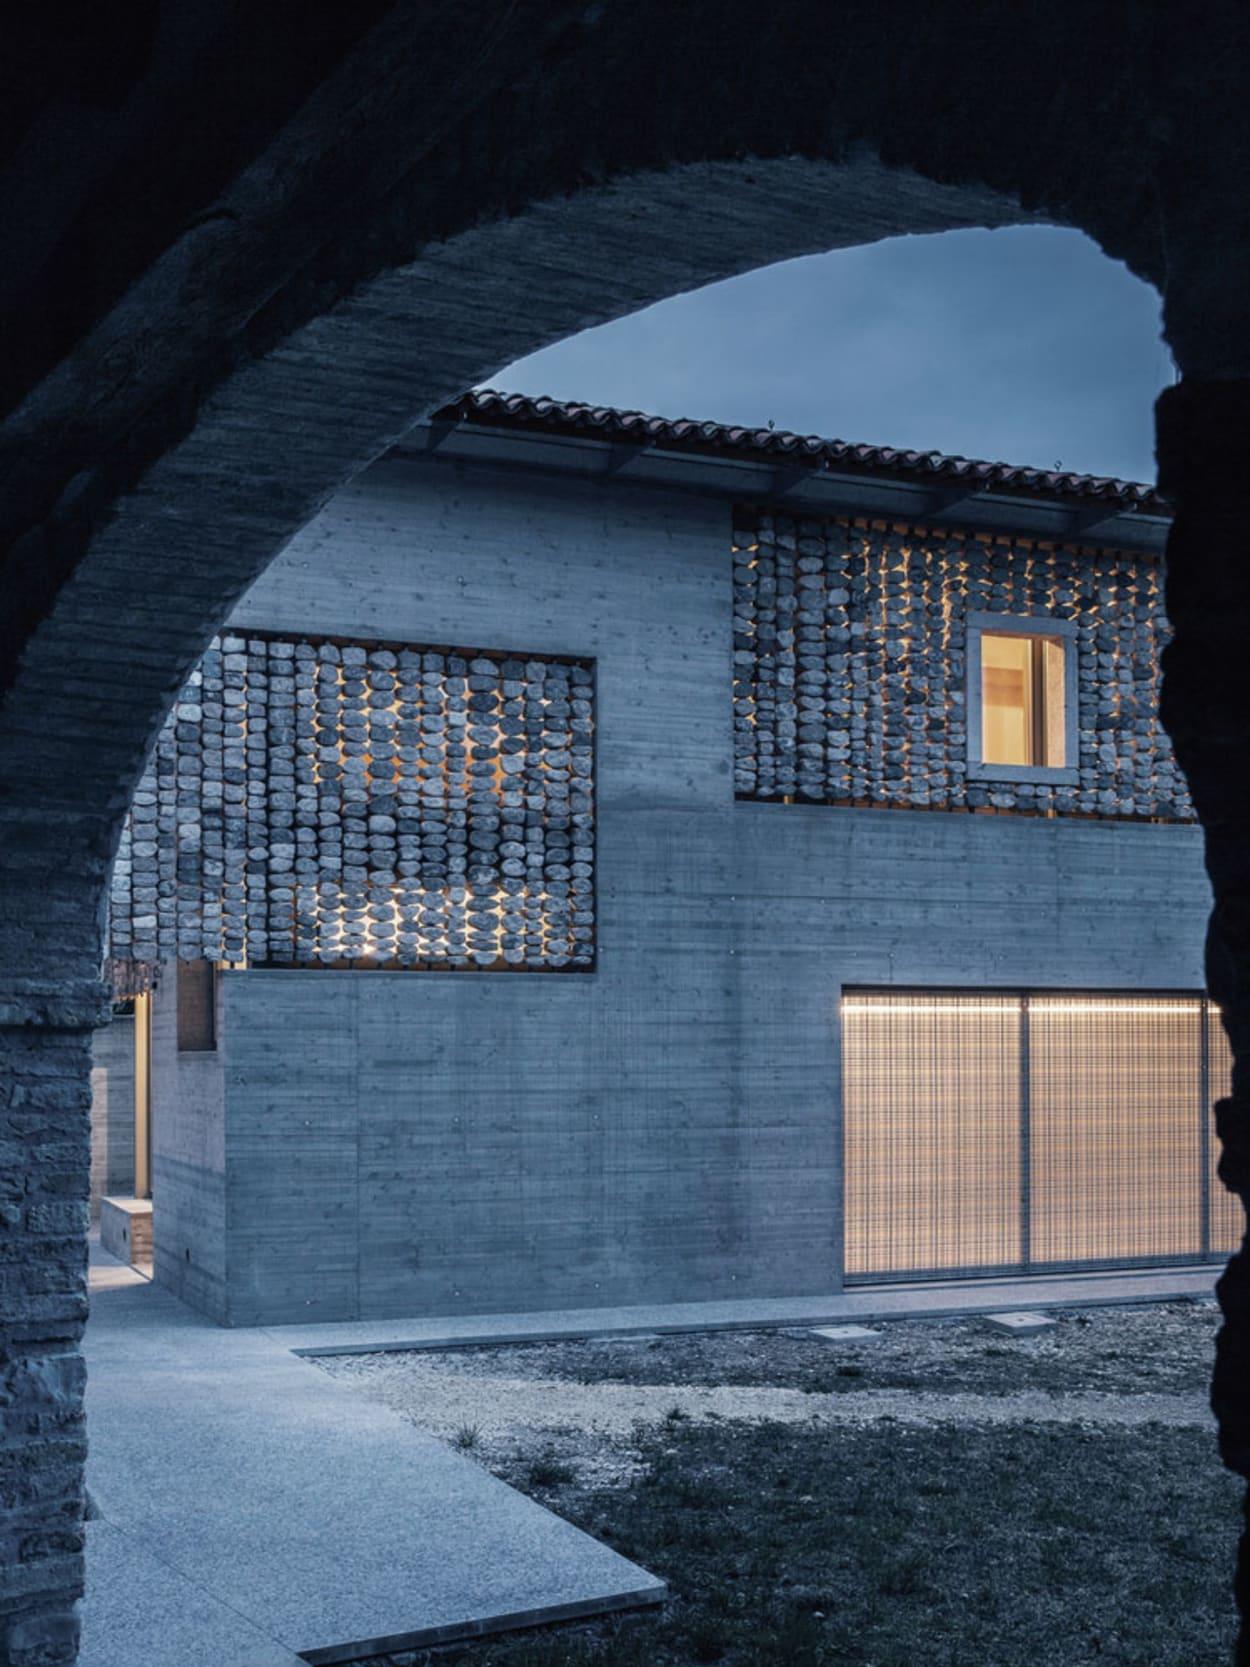 Flyingstones, Mattia Balsamini, Italien, Haus aus Stein, Stefano Pujatti